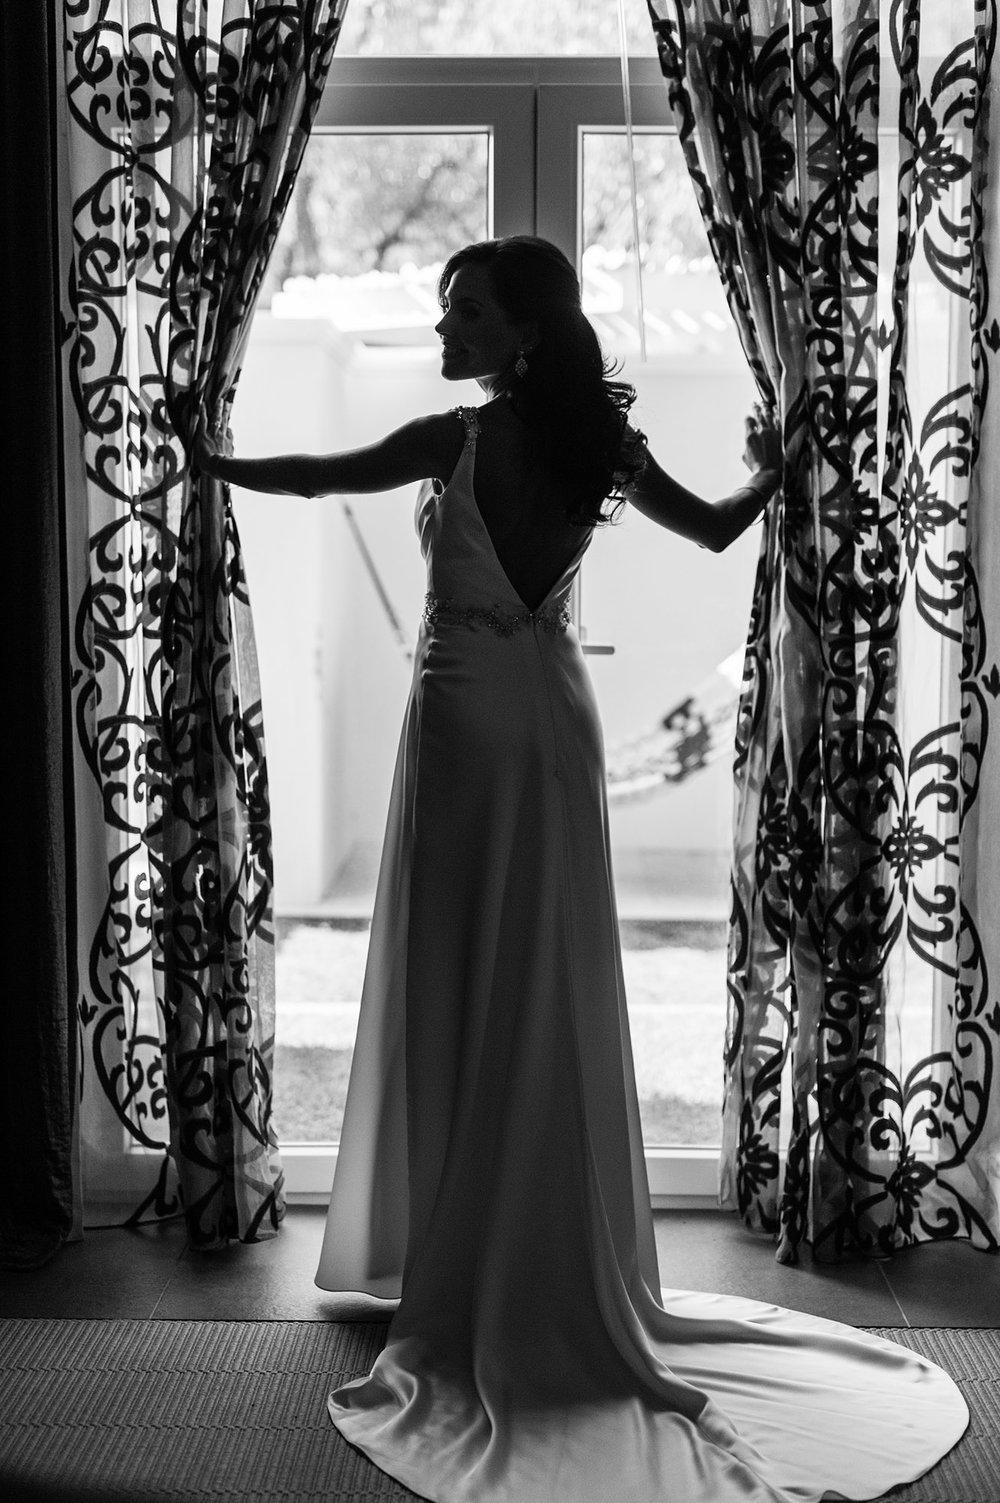 christopher-shelly-cascade-manor-wedding-photography-john-henry-bartlett-vert-002.JPG